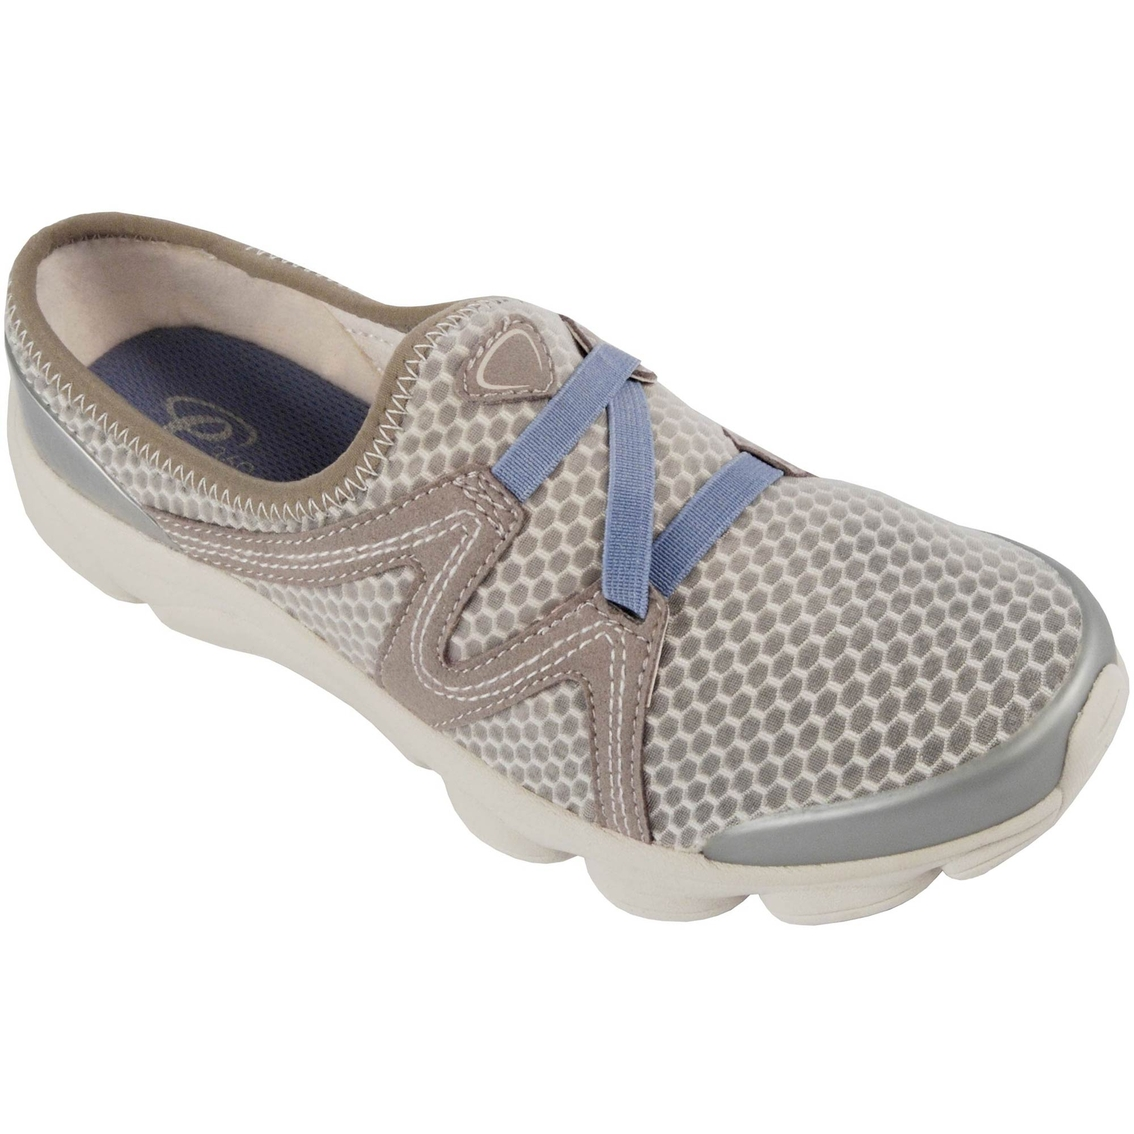 Easy Spirit Womens E360 Riptide Sneakers Walking Shoes Bedroom Slippers